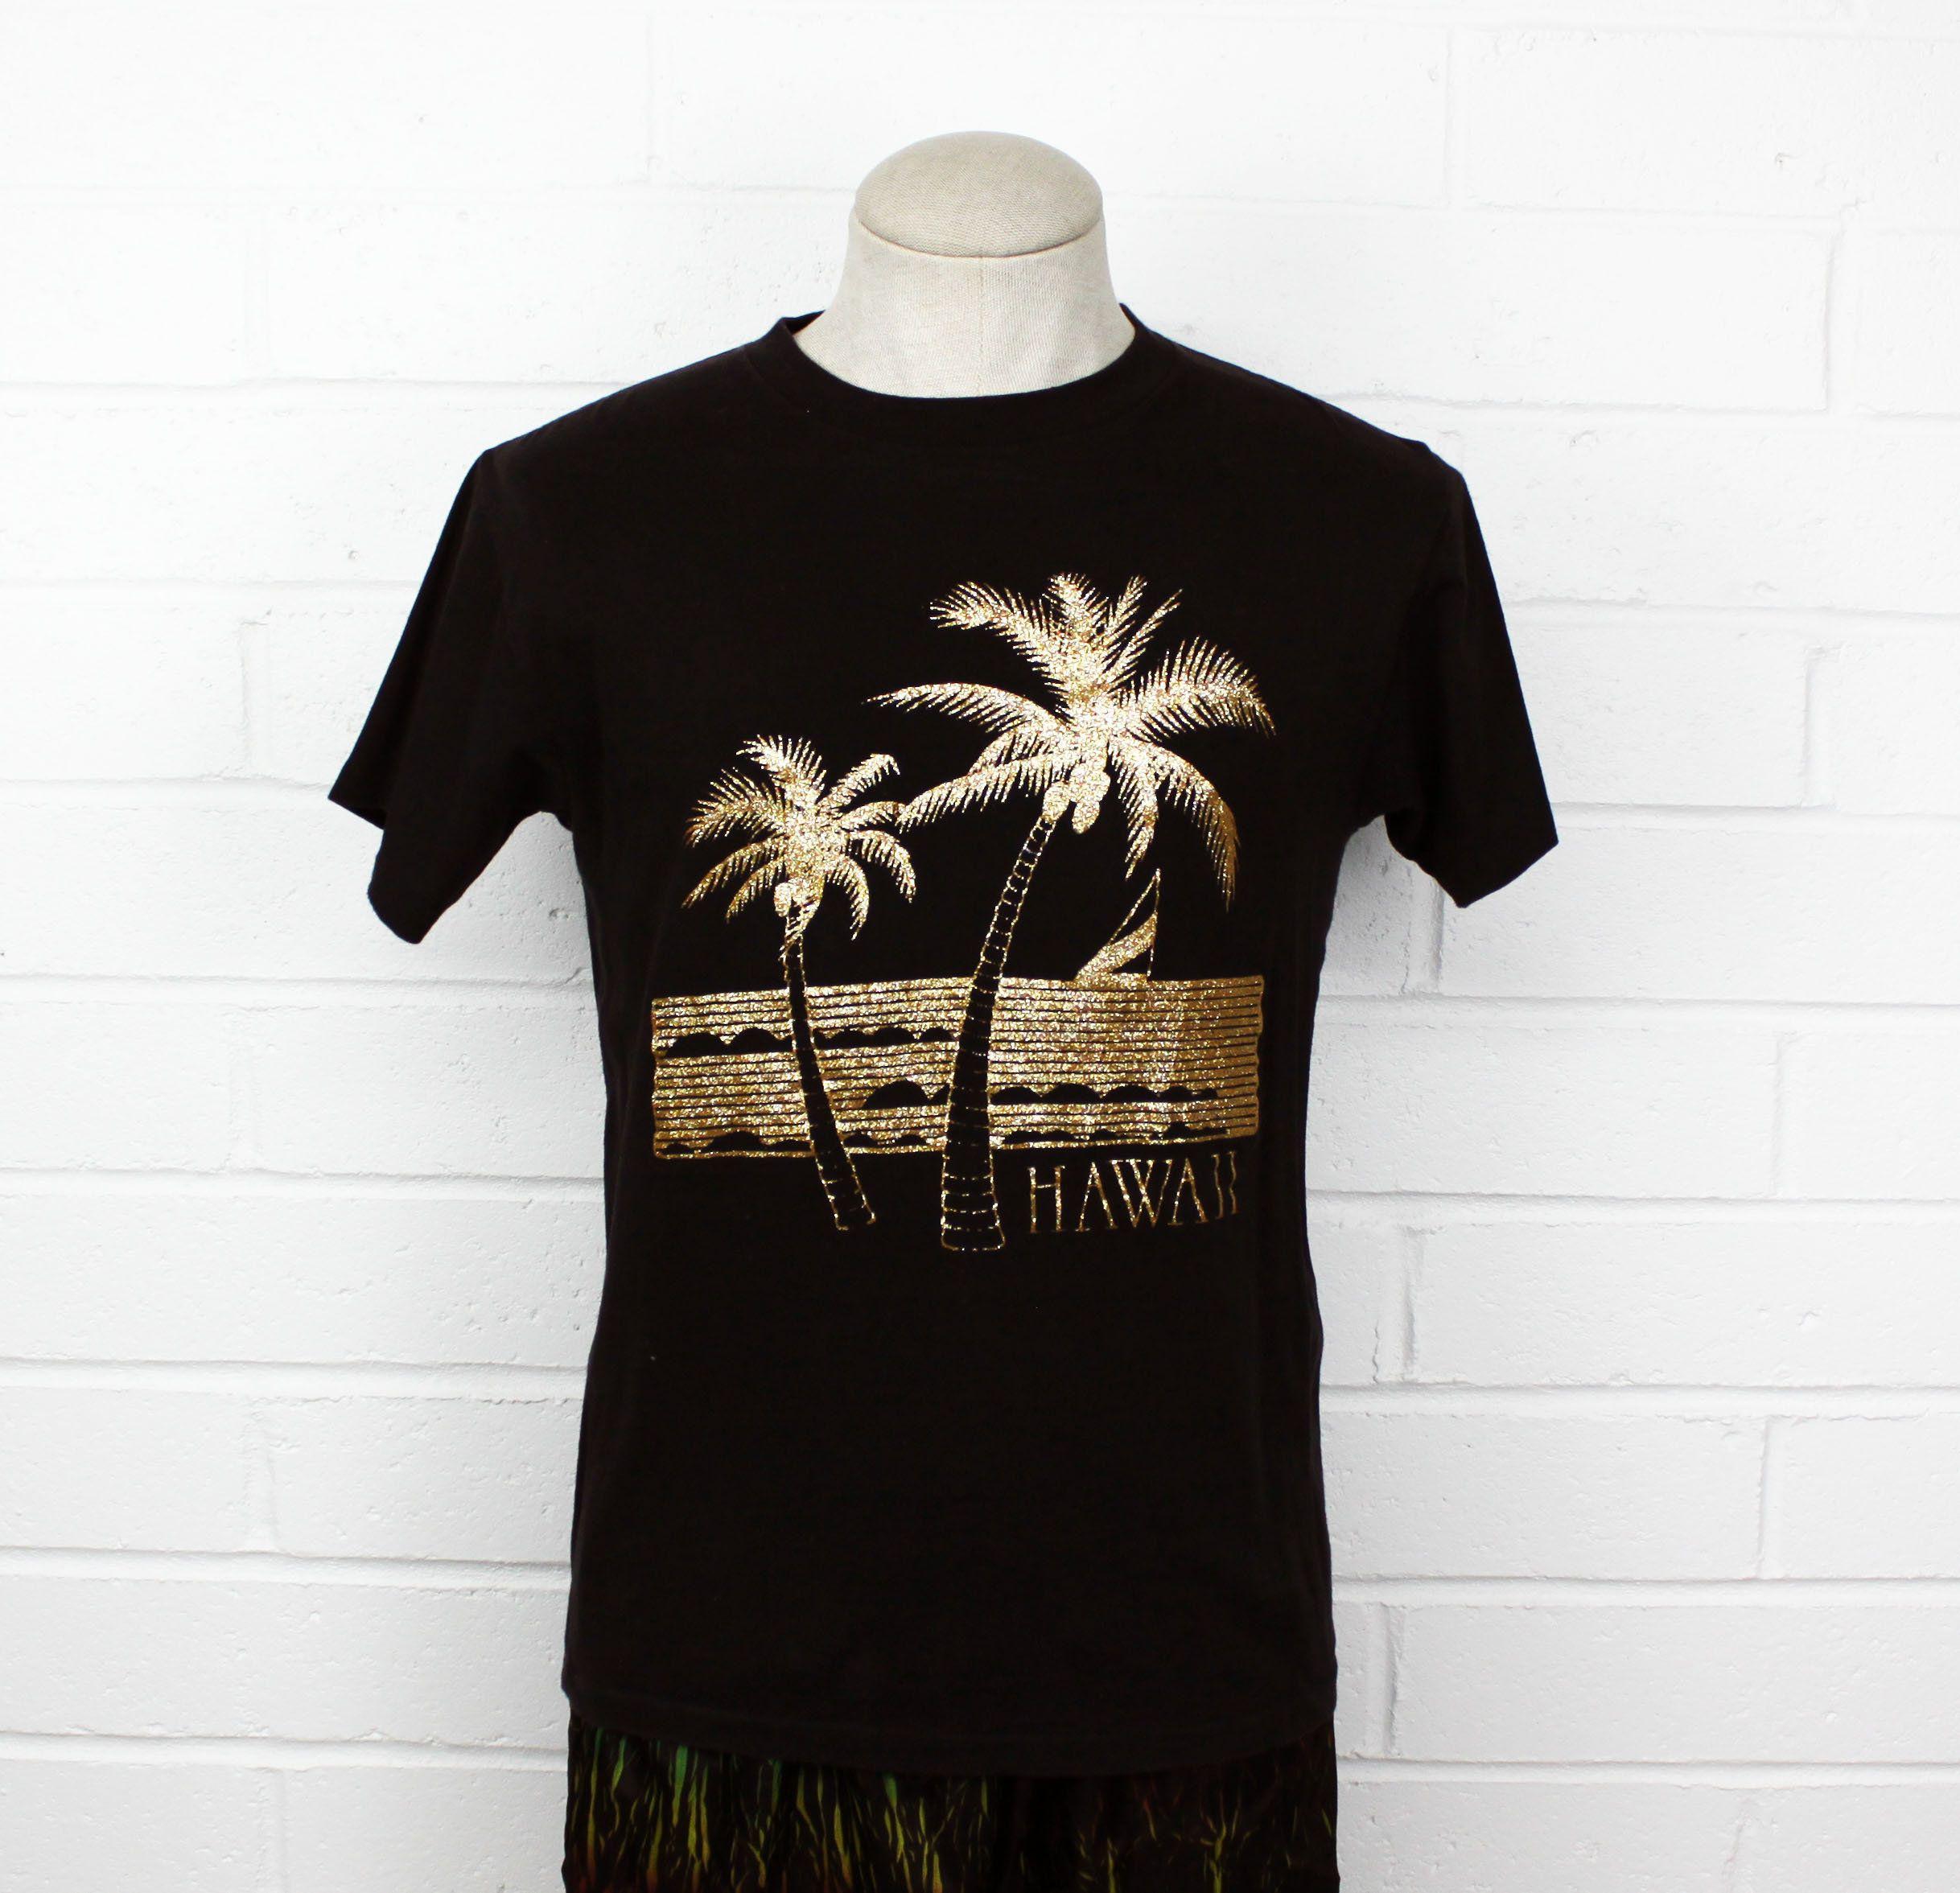 Vintage 90s Hawaii Gold Dust Shirt Black Medium Palm Trees Ocean Scene Souvenir Hawaiian T Shirt By Nack4v Vintage Hawaiian Shirts Black Shirt Hawaiian Tshirts